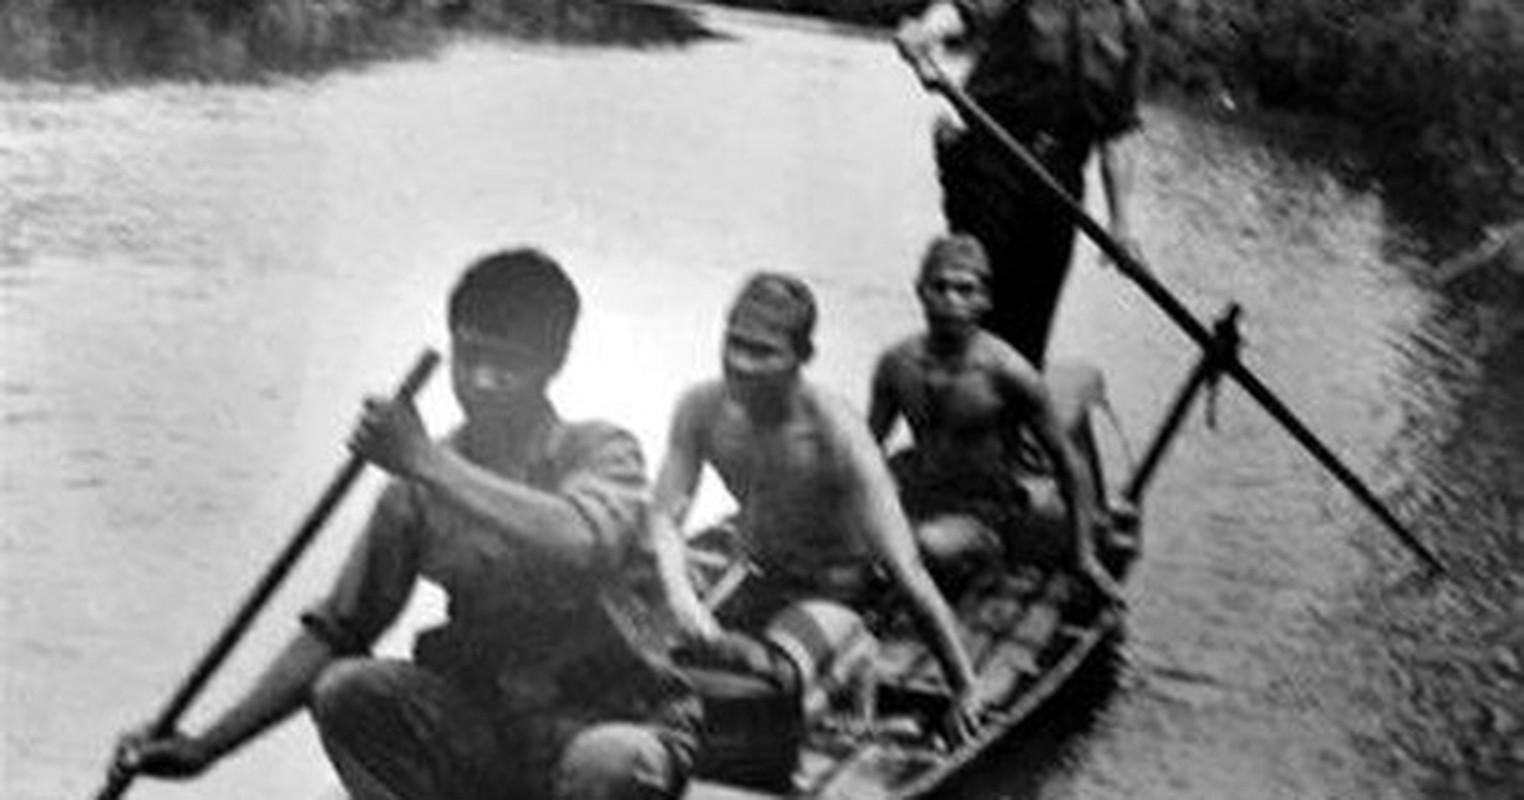 Chien tranh Viet Nam: Tran danh xung danh hau the Yet Kieu-Hinh-6